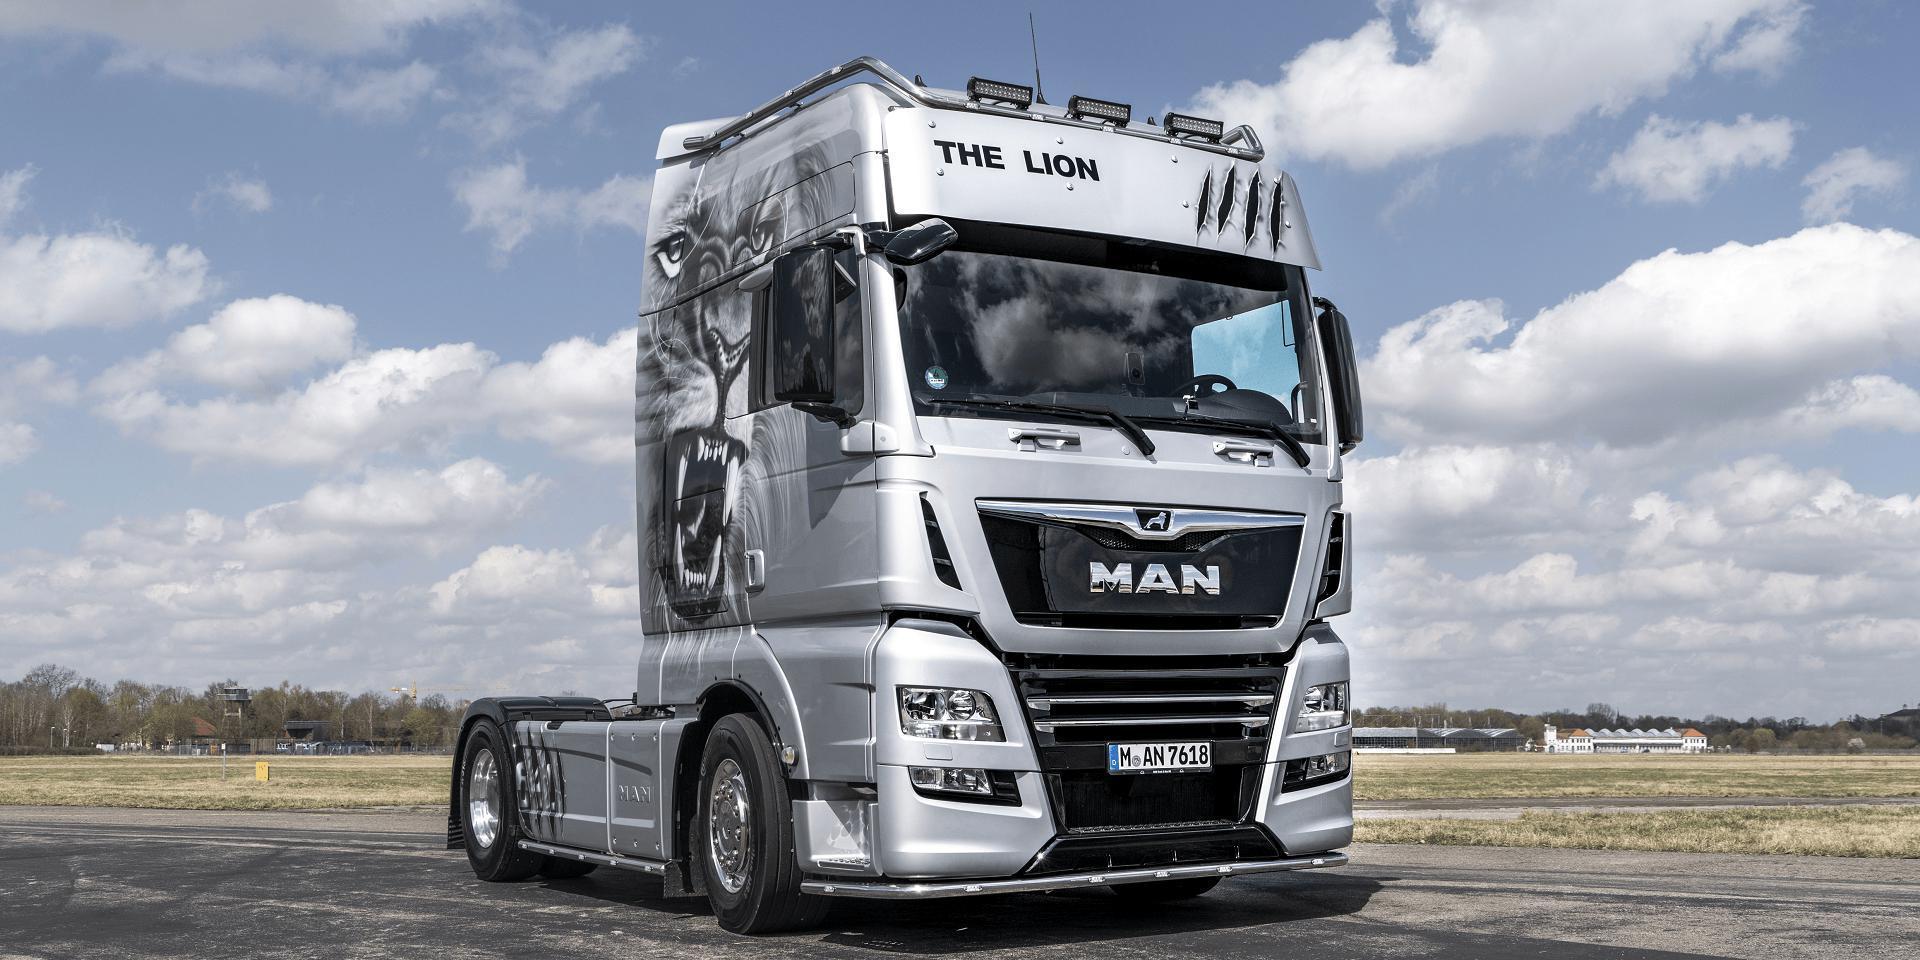 ETS2 - Man Tgx Euro 6 Real D38 Engine Sound V6 (1.36.x)